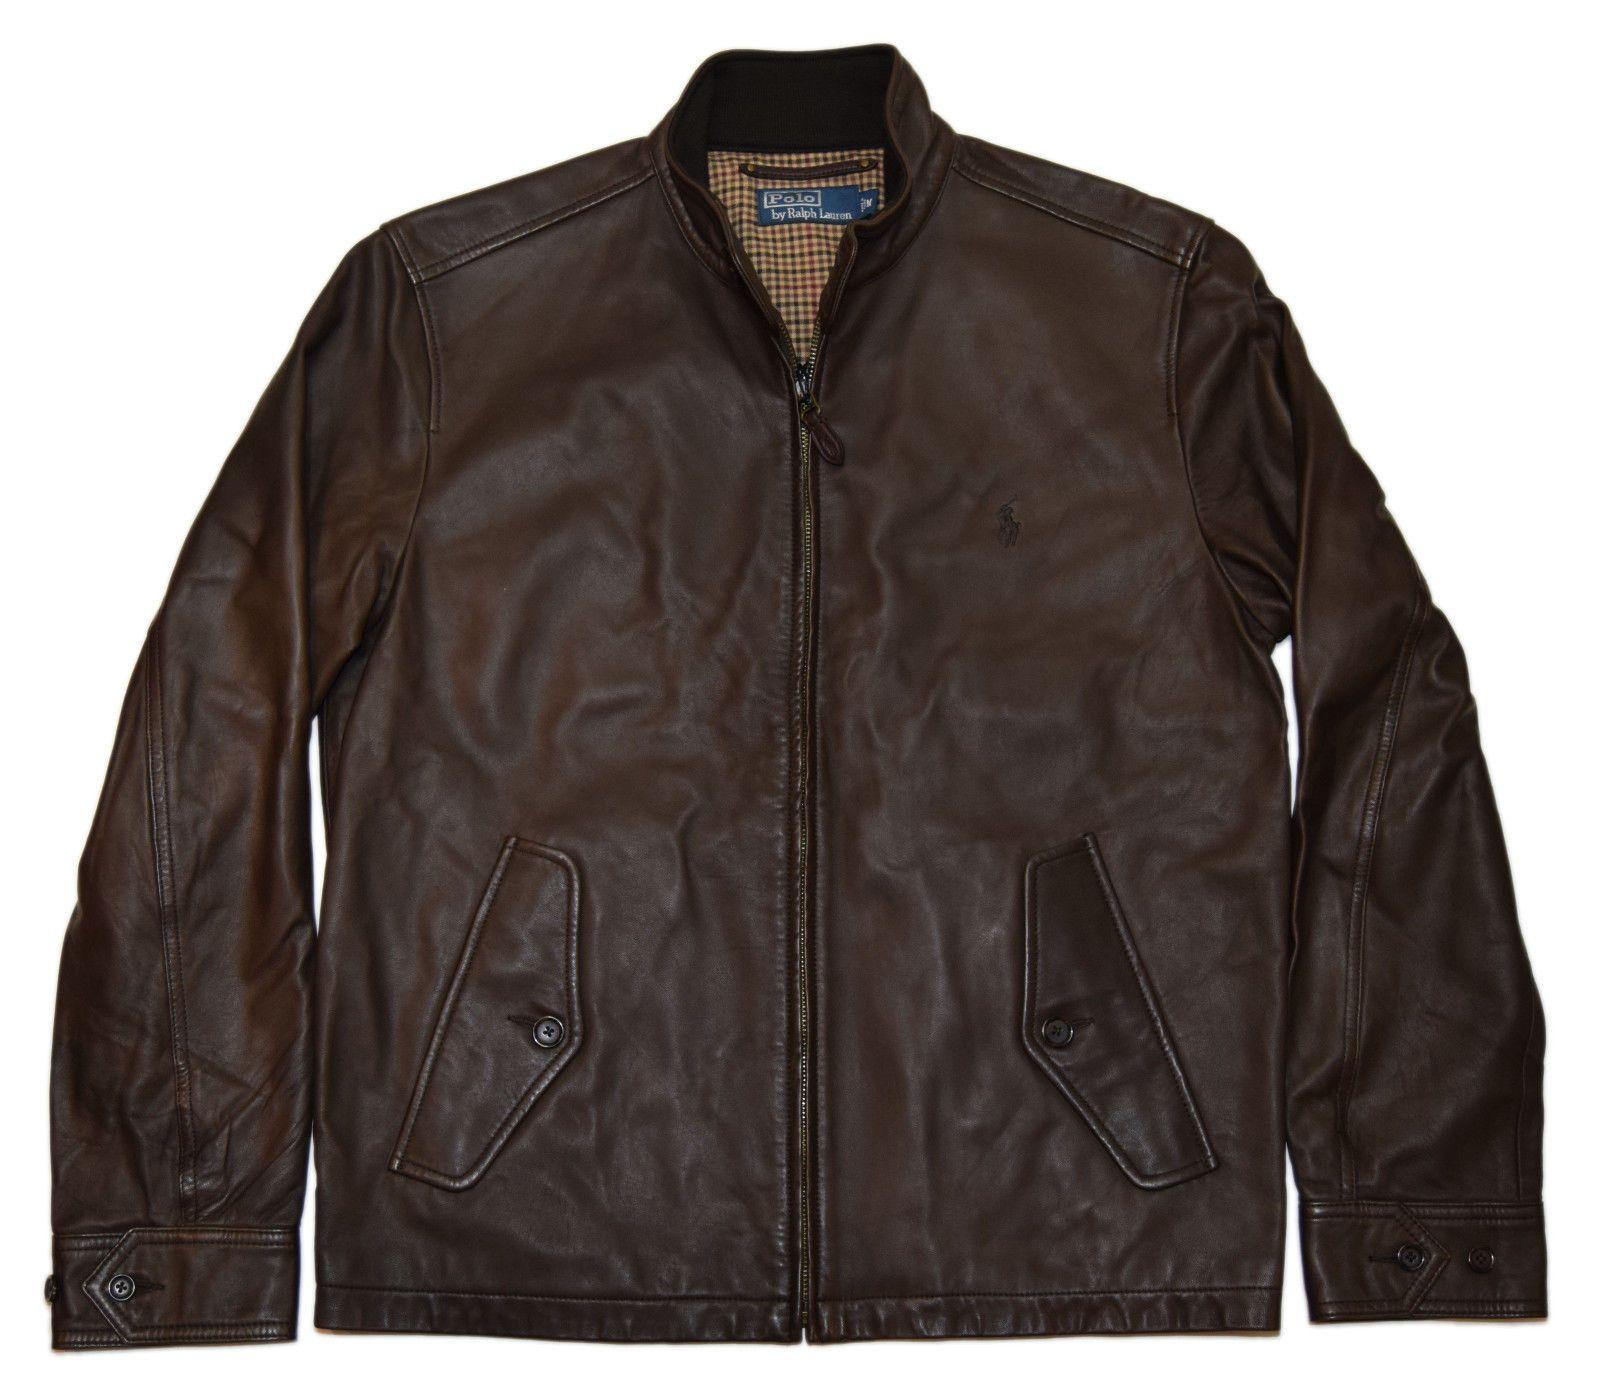 Polo Ralph Lauren Mens Half Full Zip Lambskin Leather Jacket Coat Brown Small Lambskin Leather Jacket Leather Jacket Leather Jacket Men [ 1397 x 1600 Pixel ]